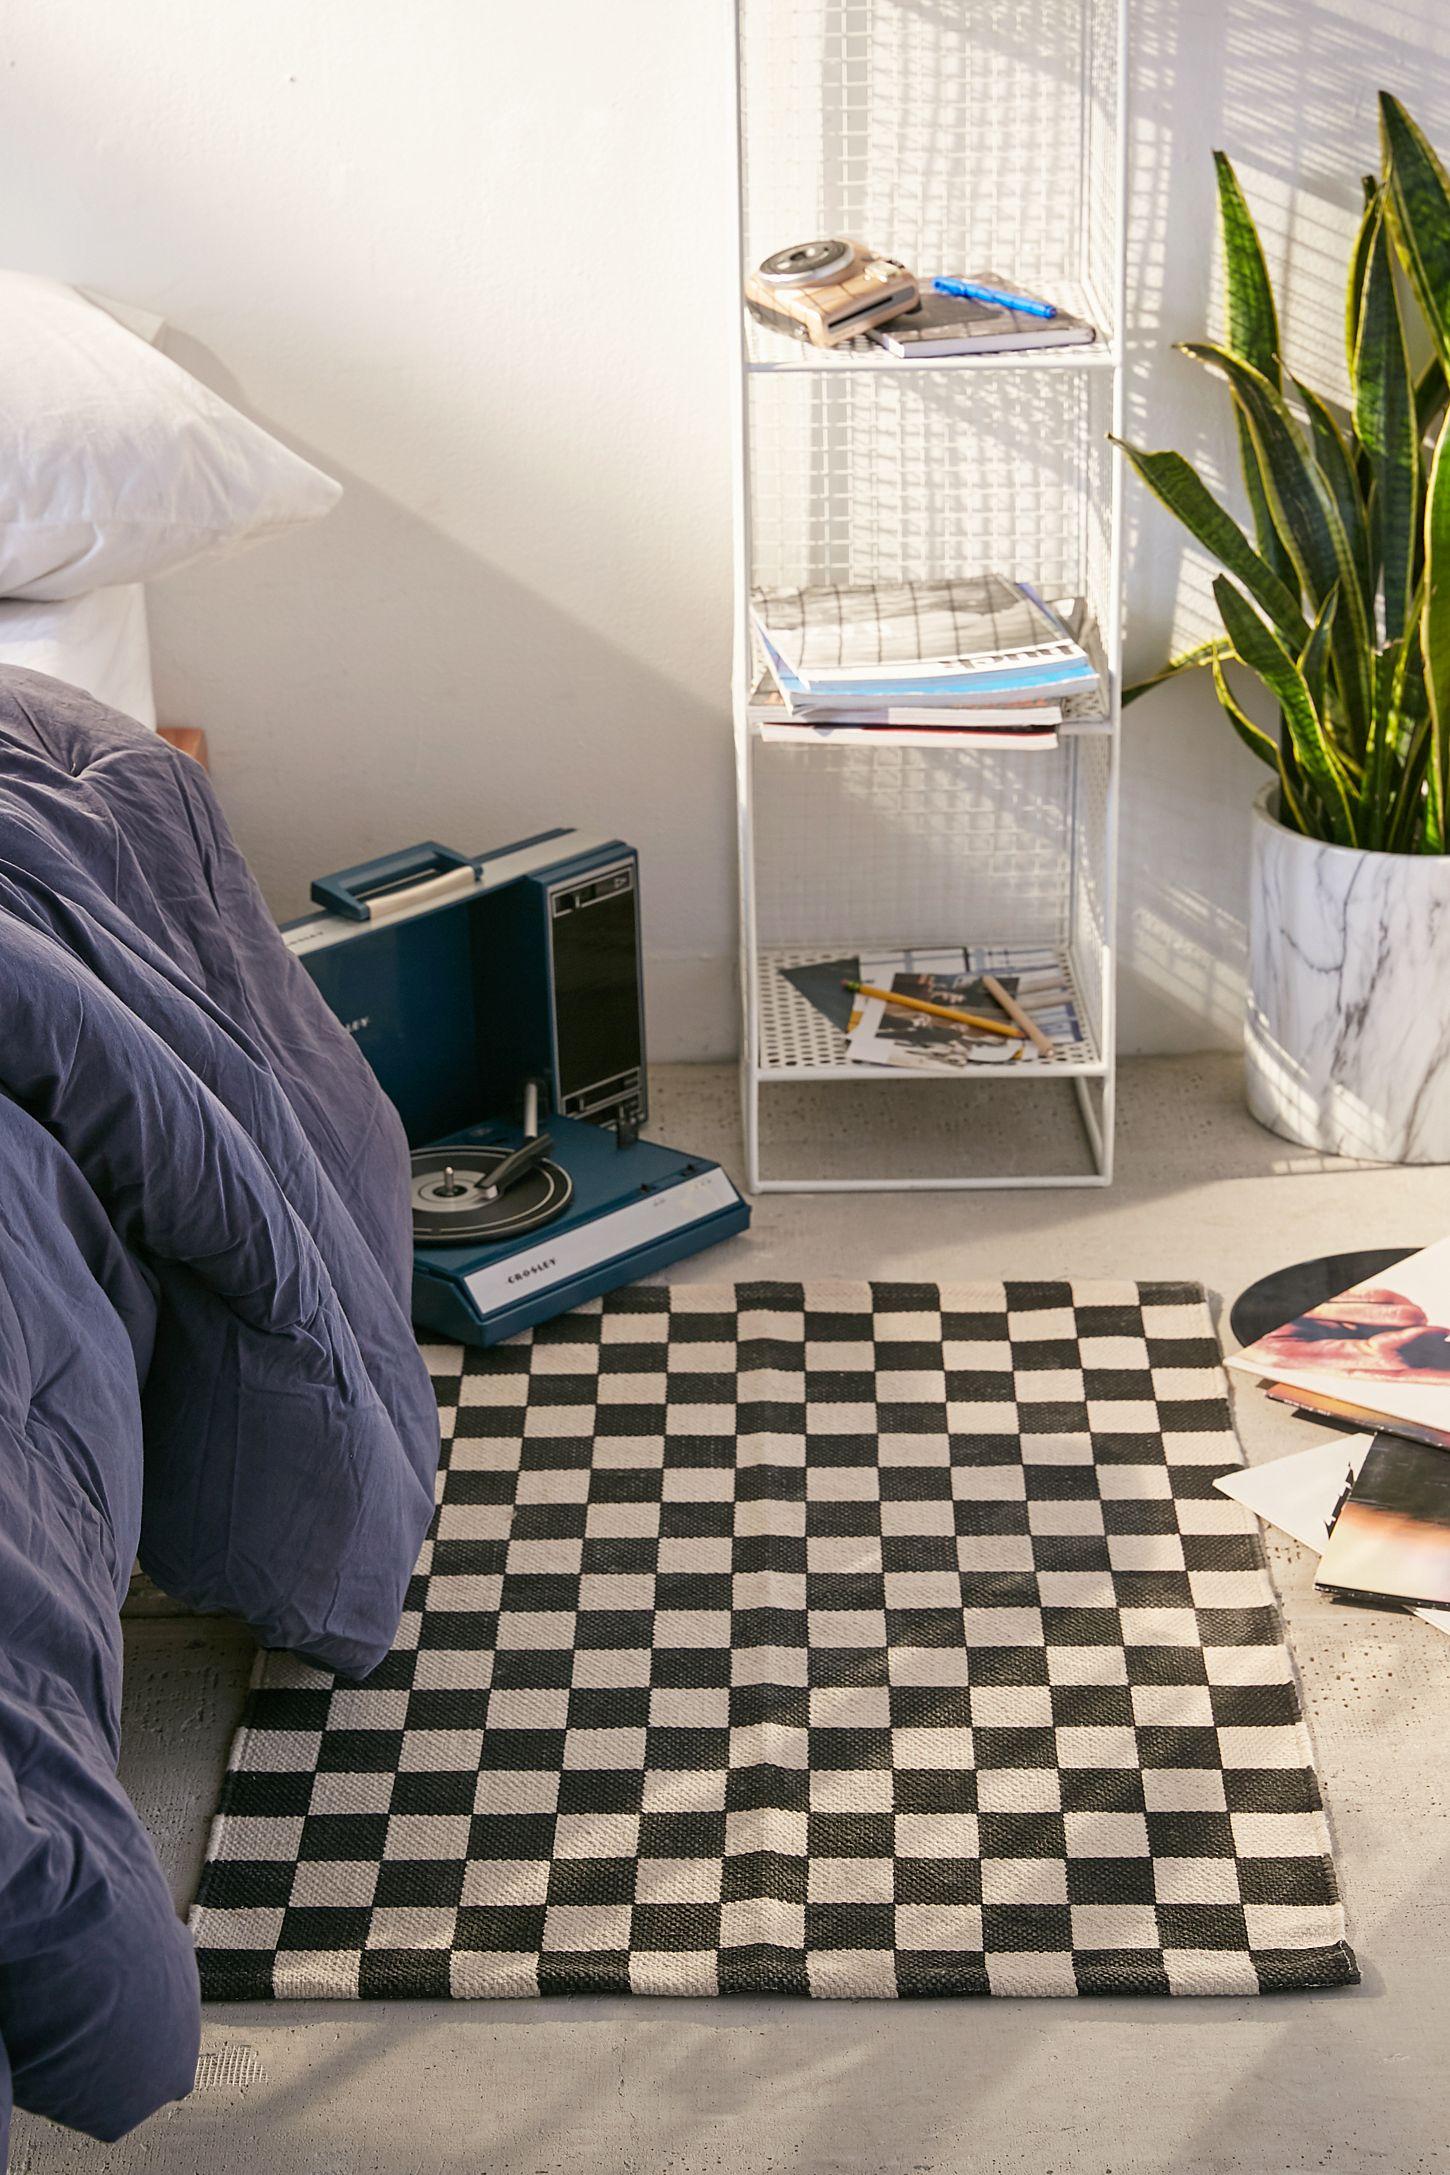 Checkerboard Rug Game Area Rug Ideas